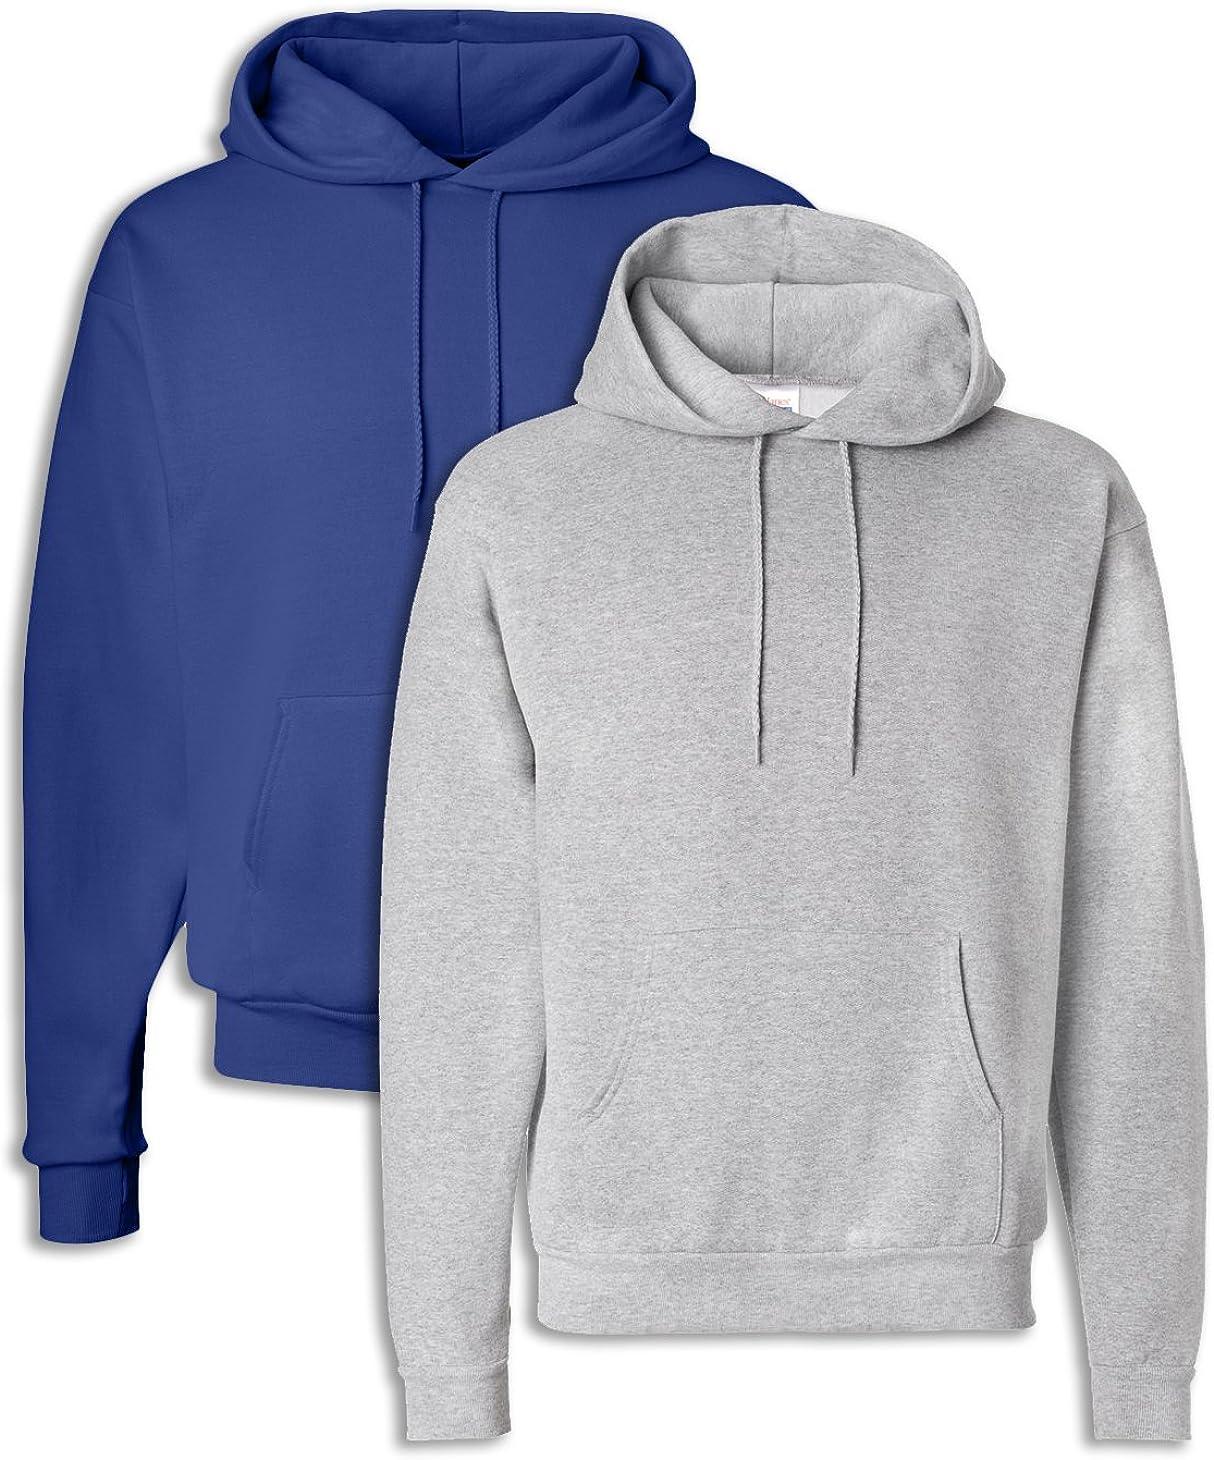 Hanes P170 Mens EcoSmart Hooded Sweatshirt Small 1 Deep Royal 1 Light Steel